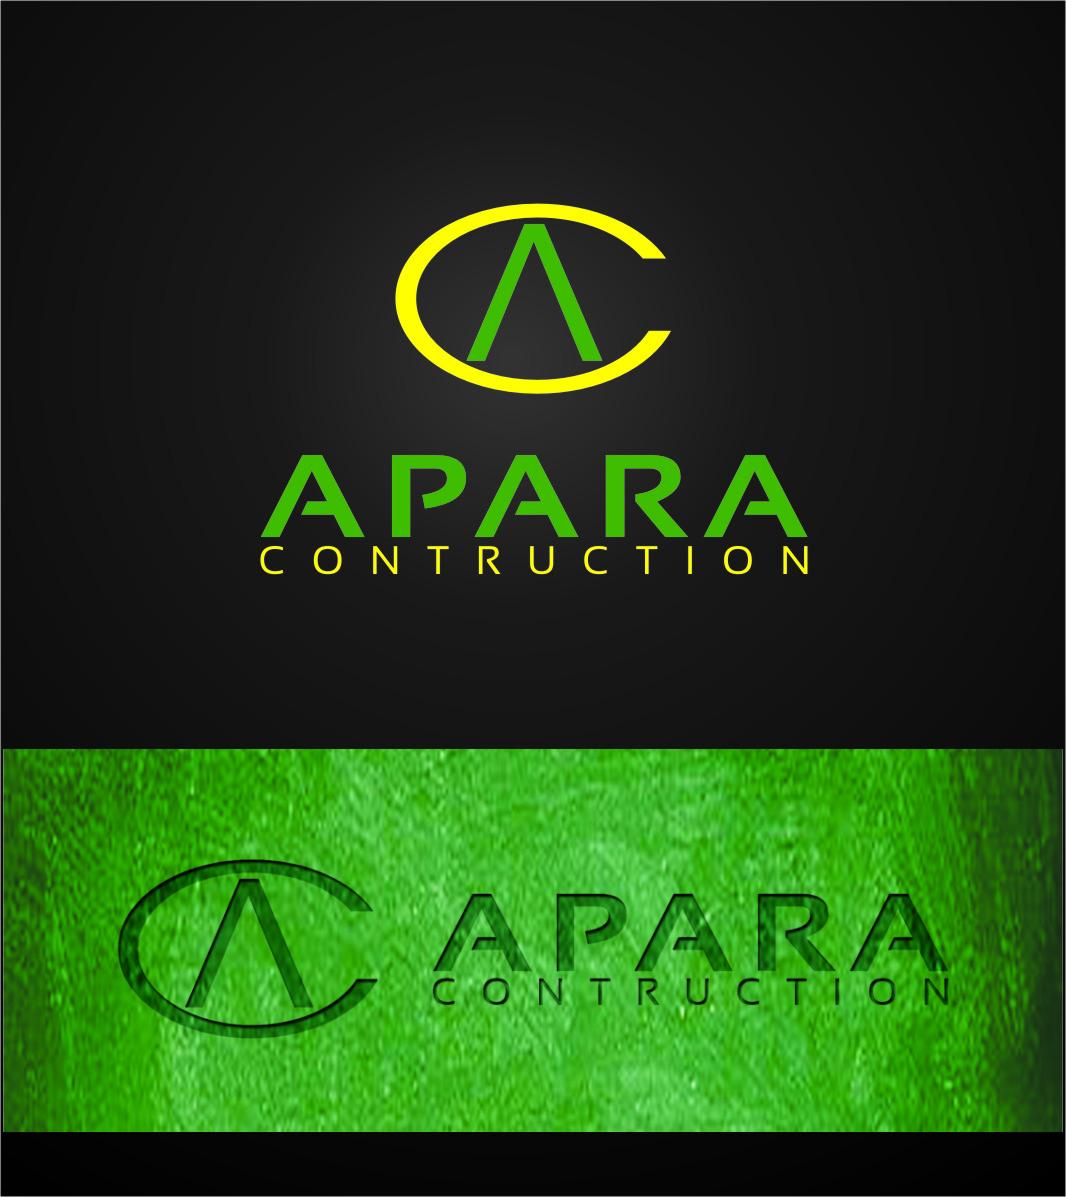 Logo Design by RoSyid Rono-Rene On Java - Entry No. 87 in the Logo Design Contest Apara Construction Logo Design.